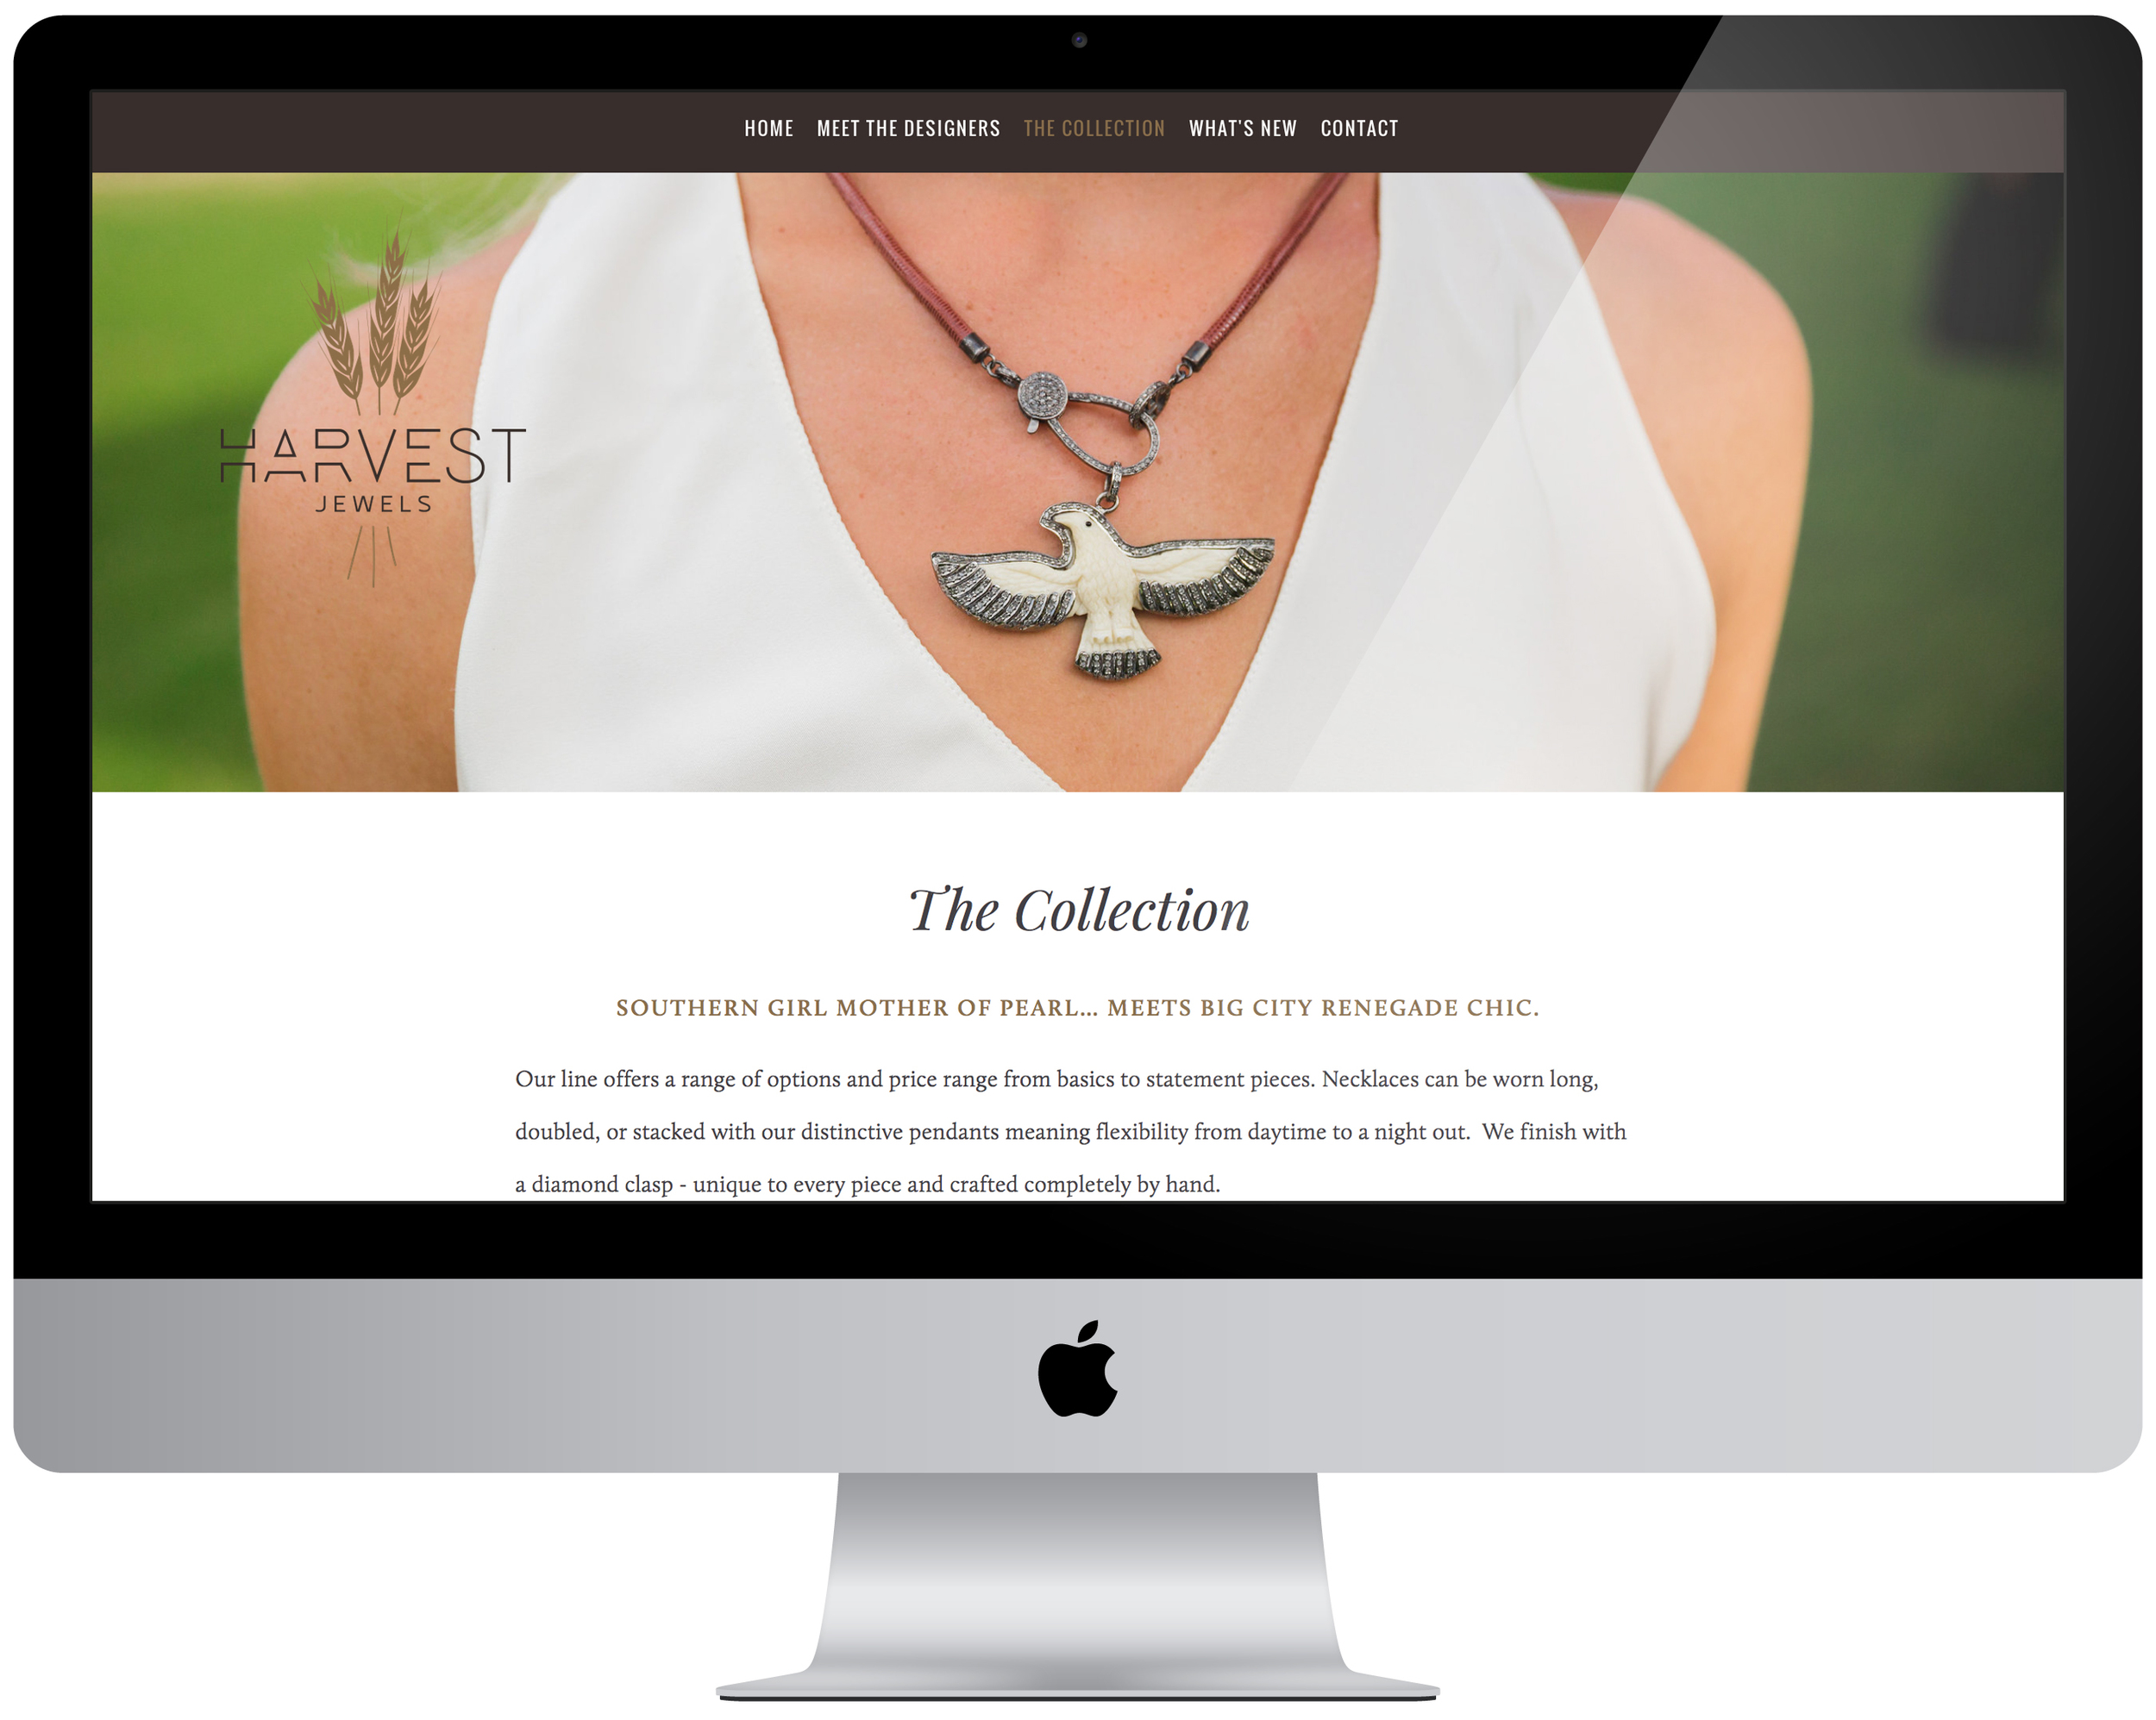 HJ-collection.jpg